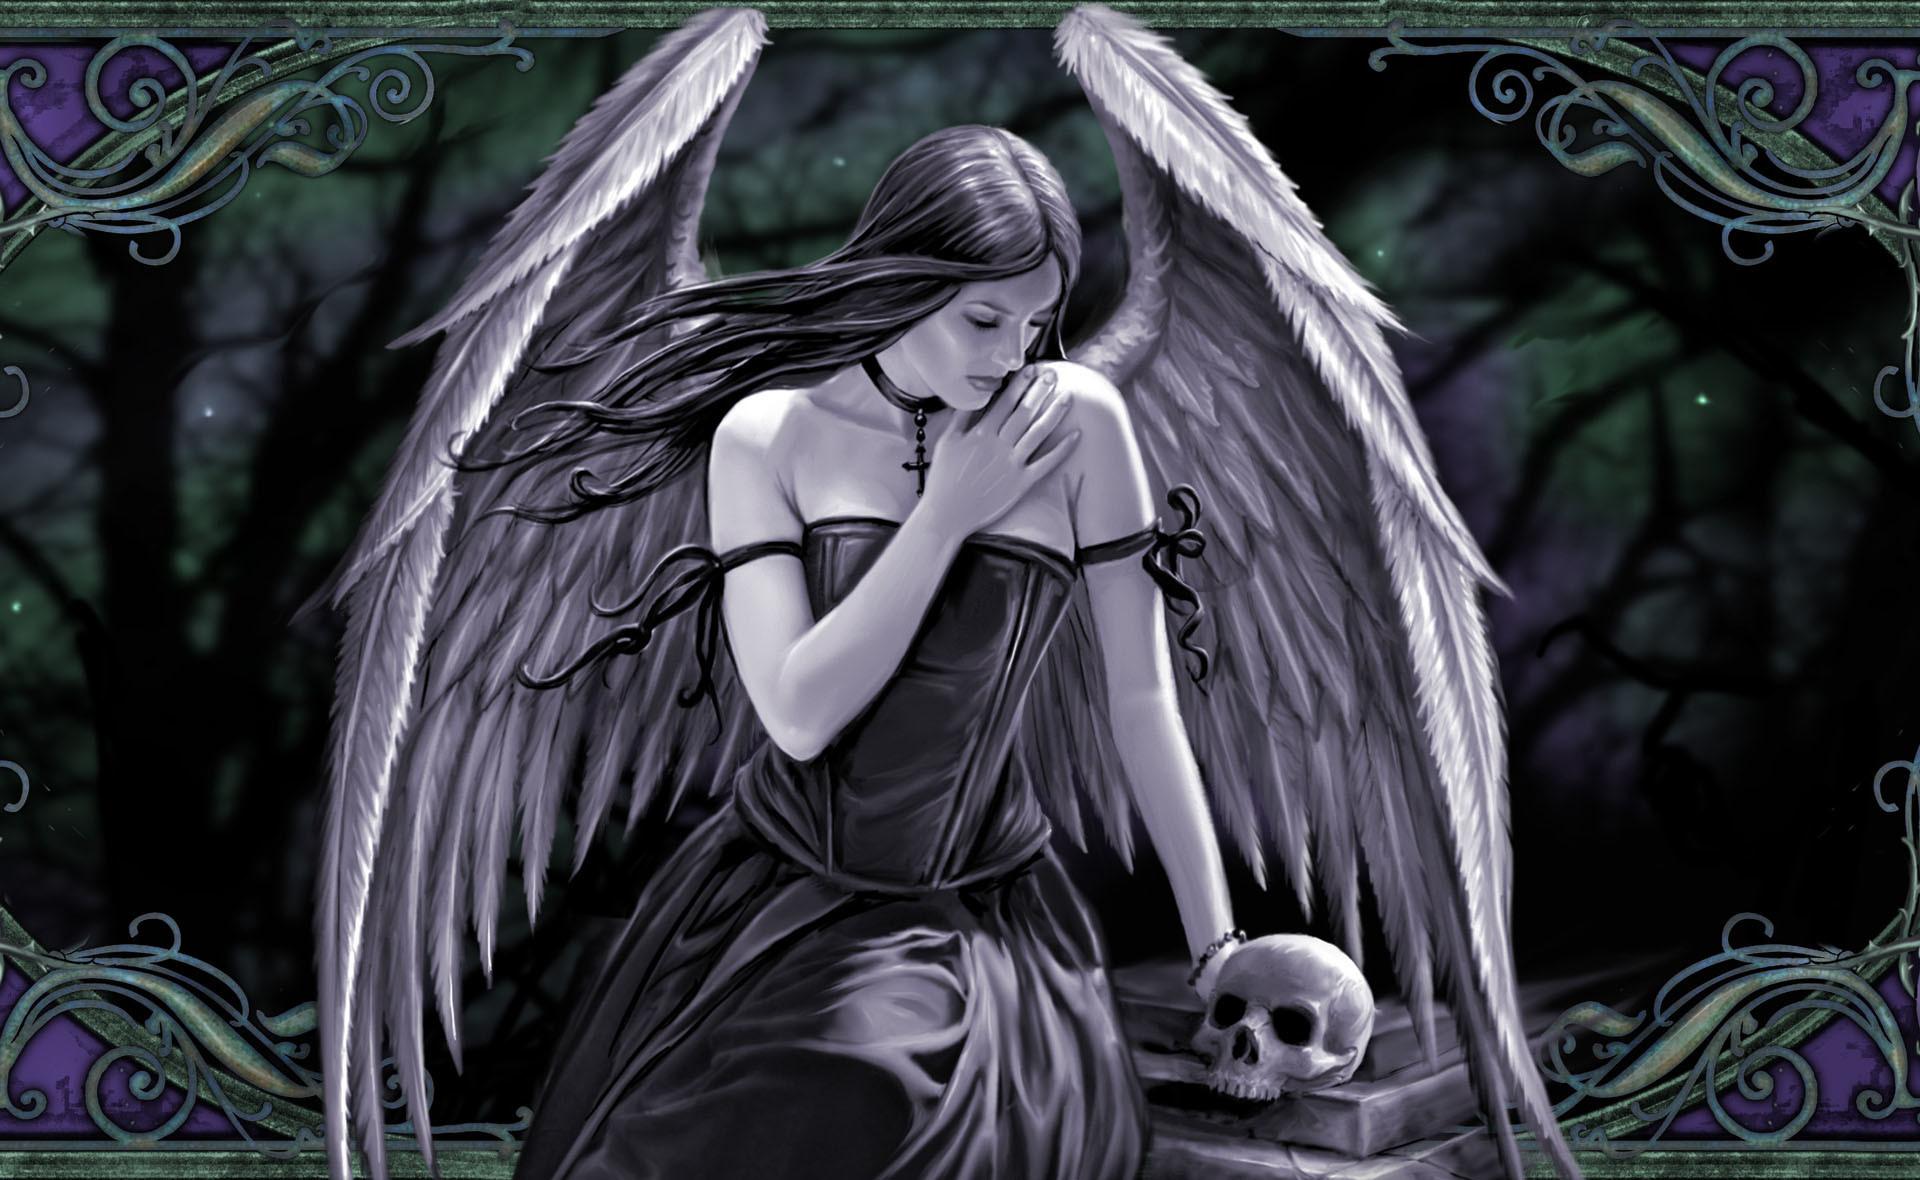 Gothic skulls wallpaper wallpapertag - Dark gothic angel wallpaper ...